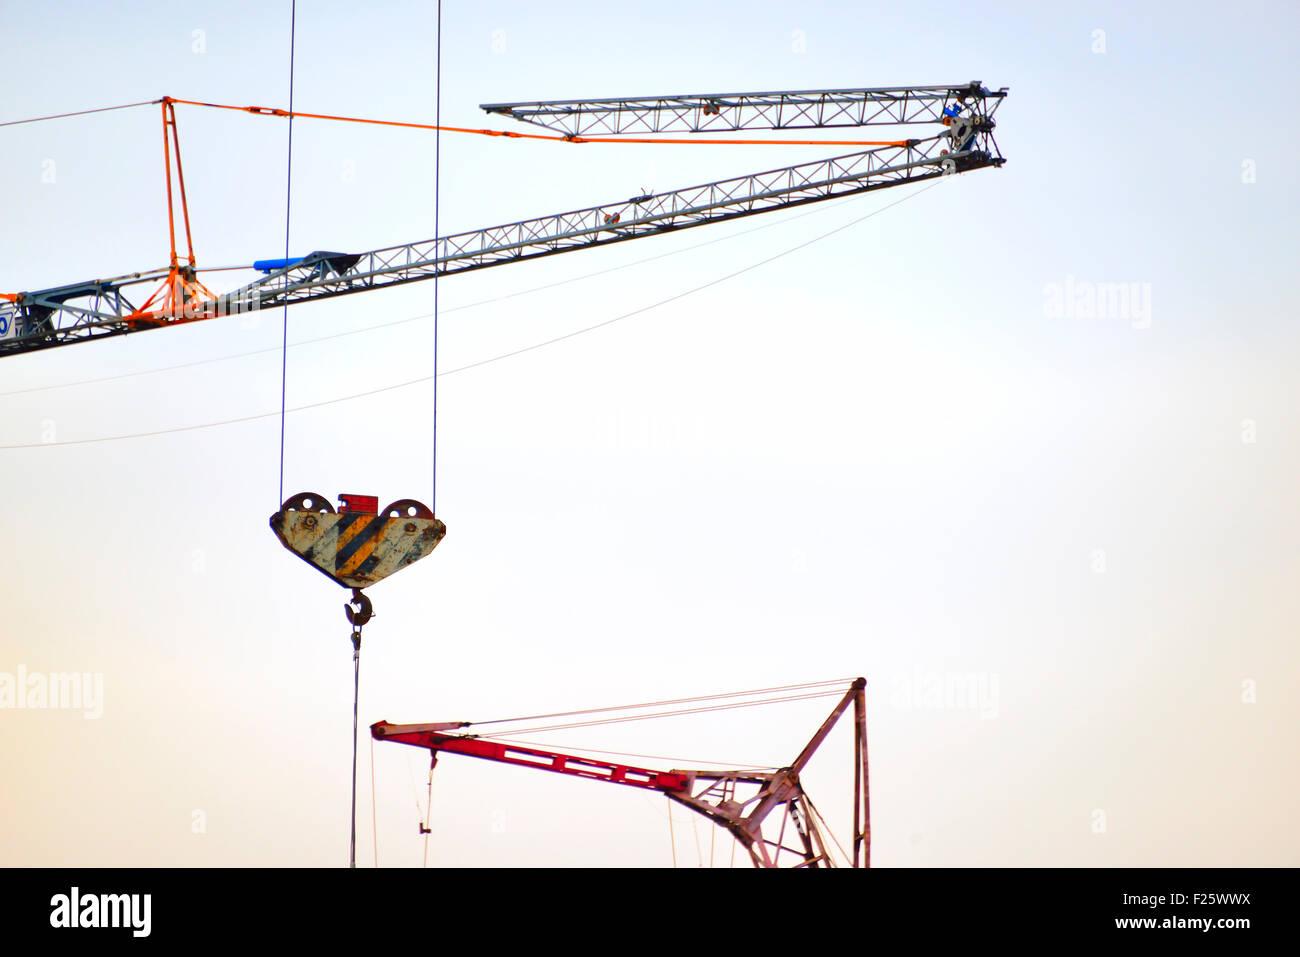 Tower Crane Parts Stock Photos & Tower Crane Parts Stock Images - Alamy